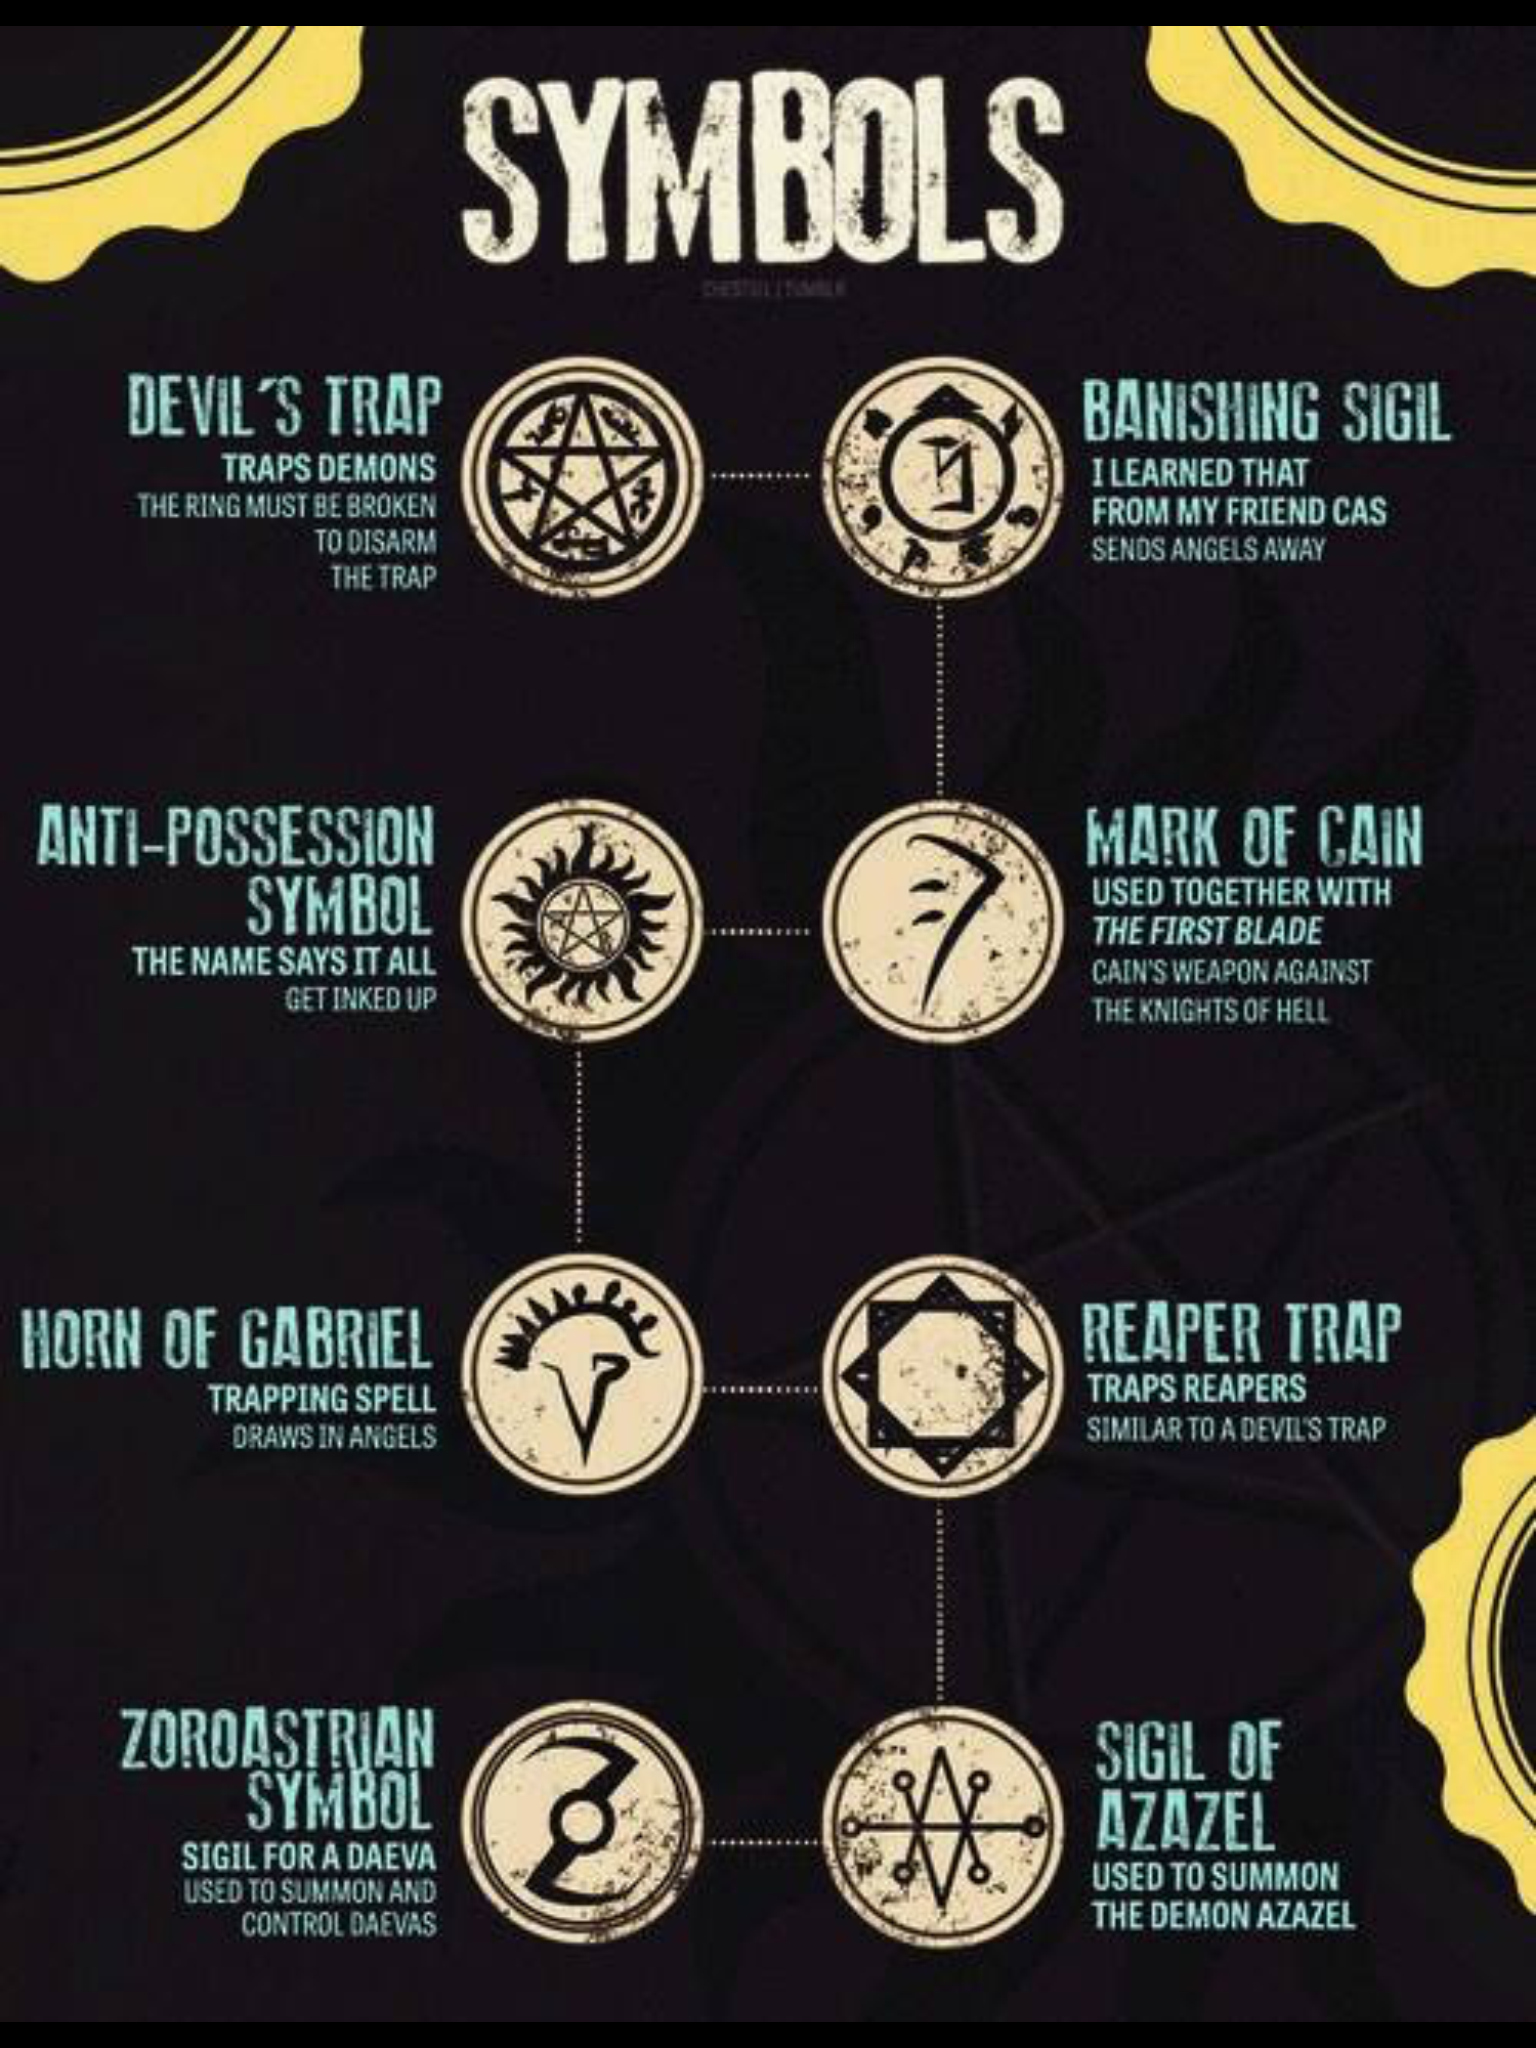 Supernatural Symbols Meaning Supernatural Teen Fandom Pinterest